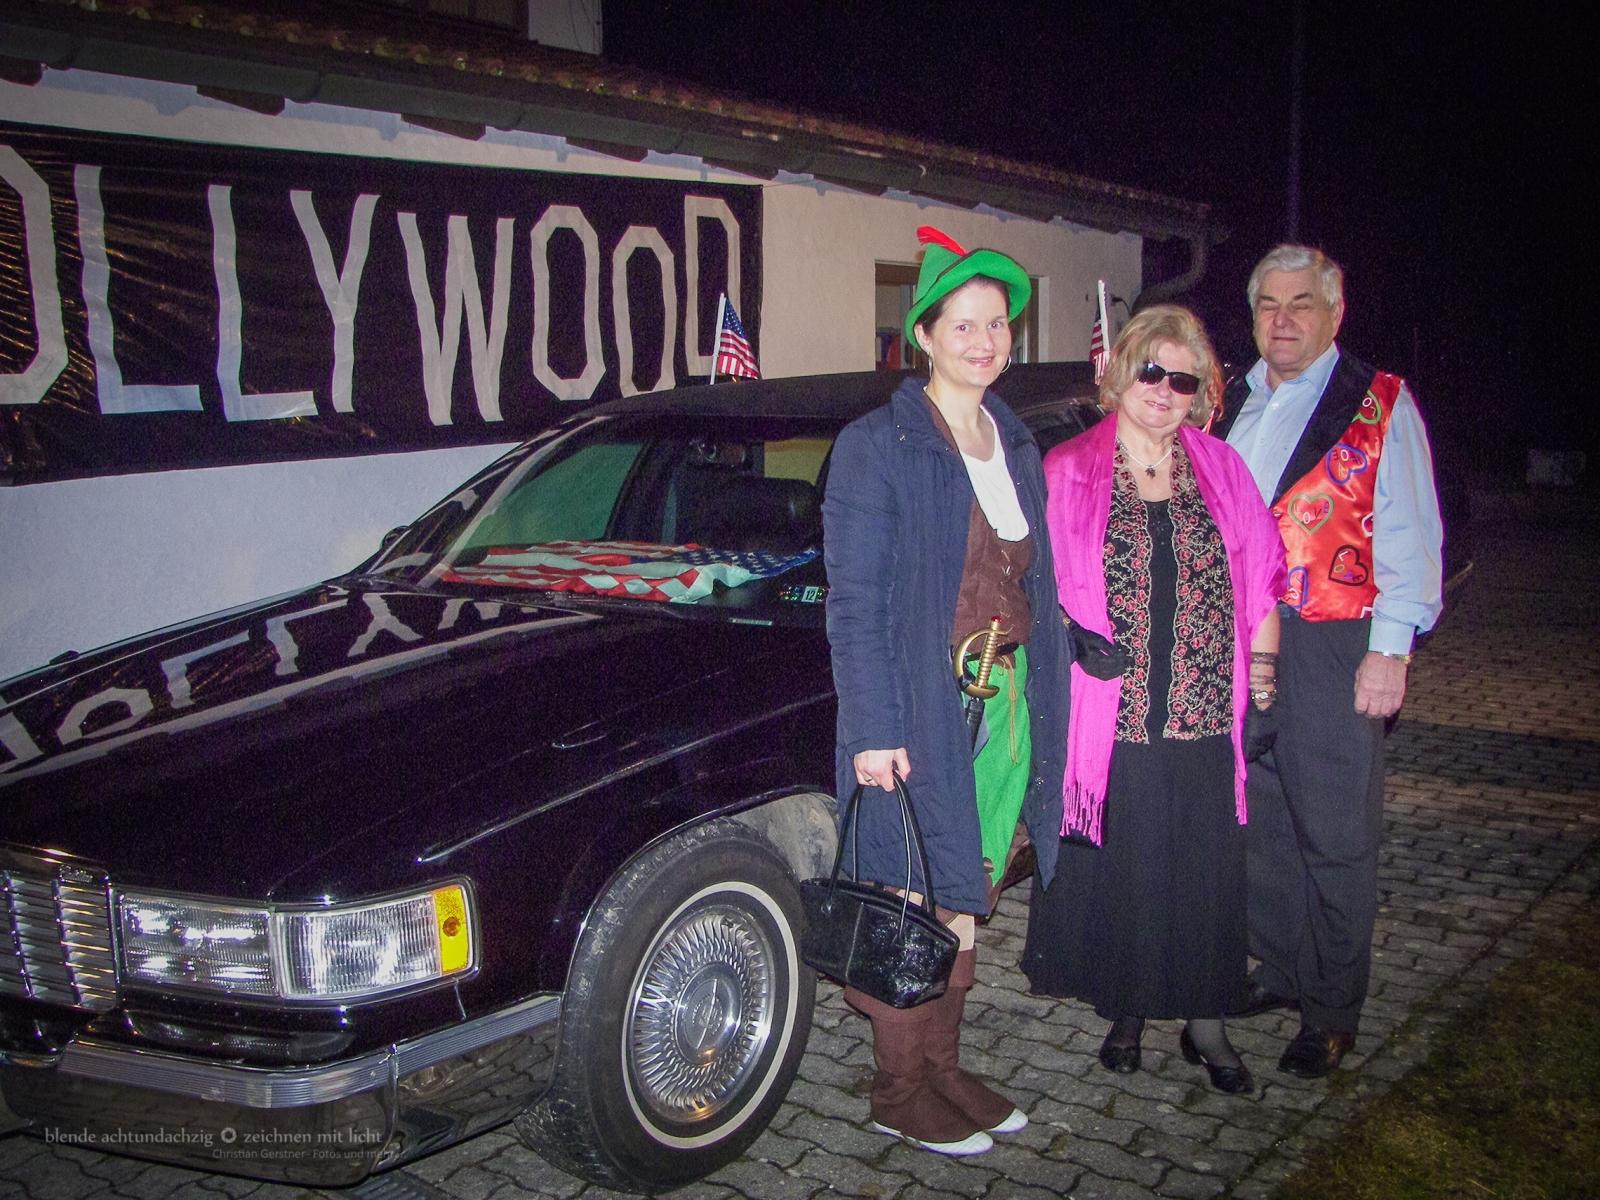 Hollywood-13